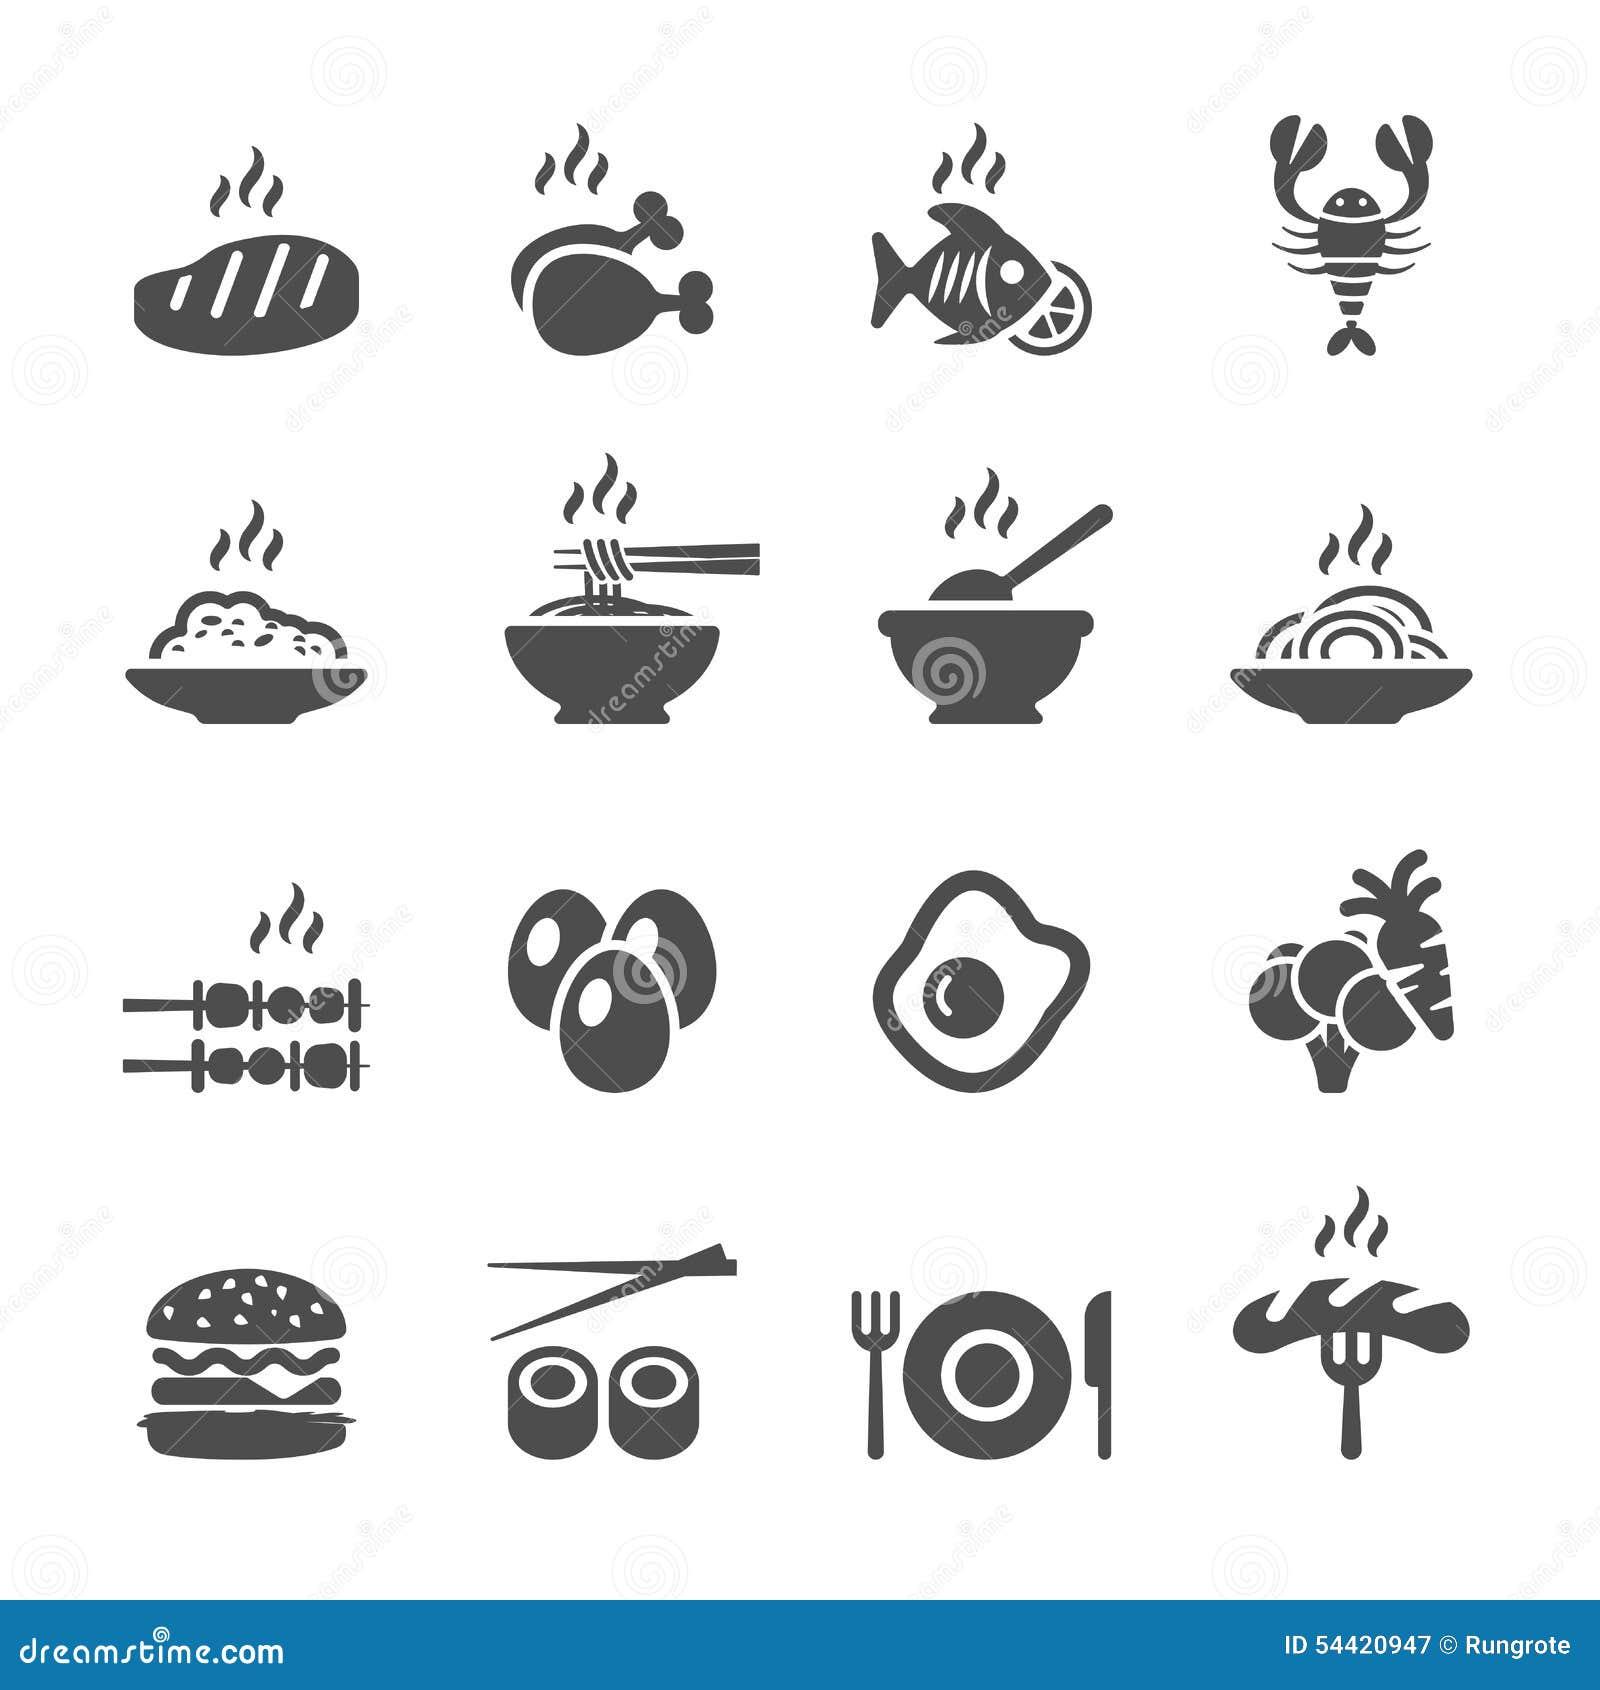 Food icon set, vector eps10